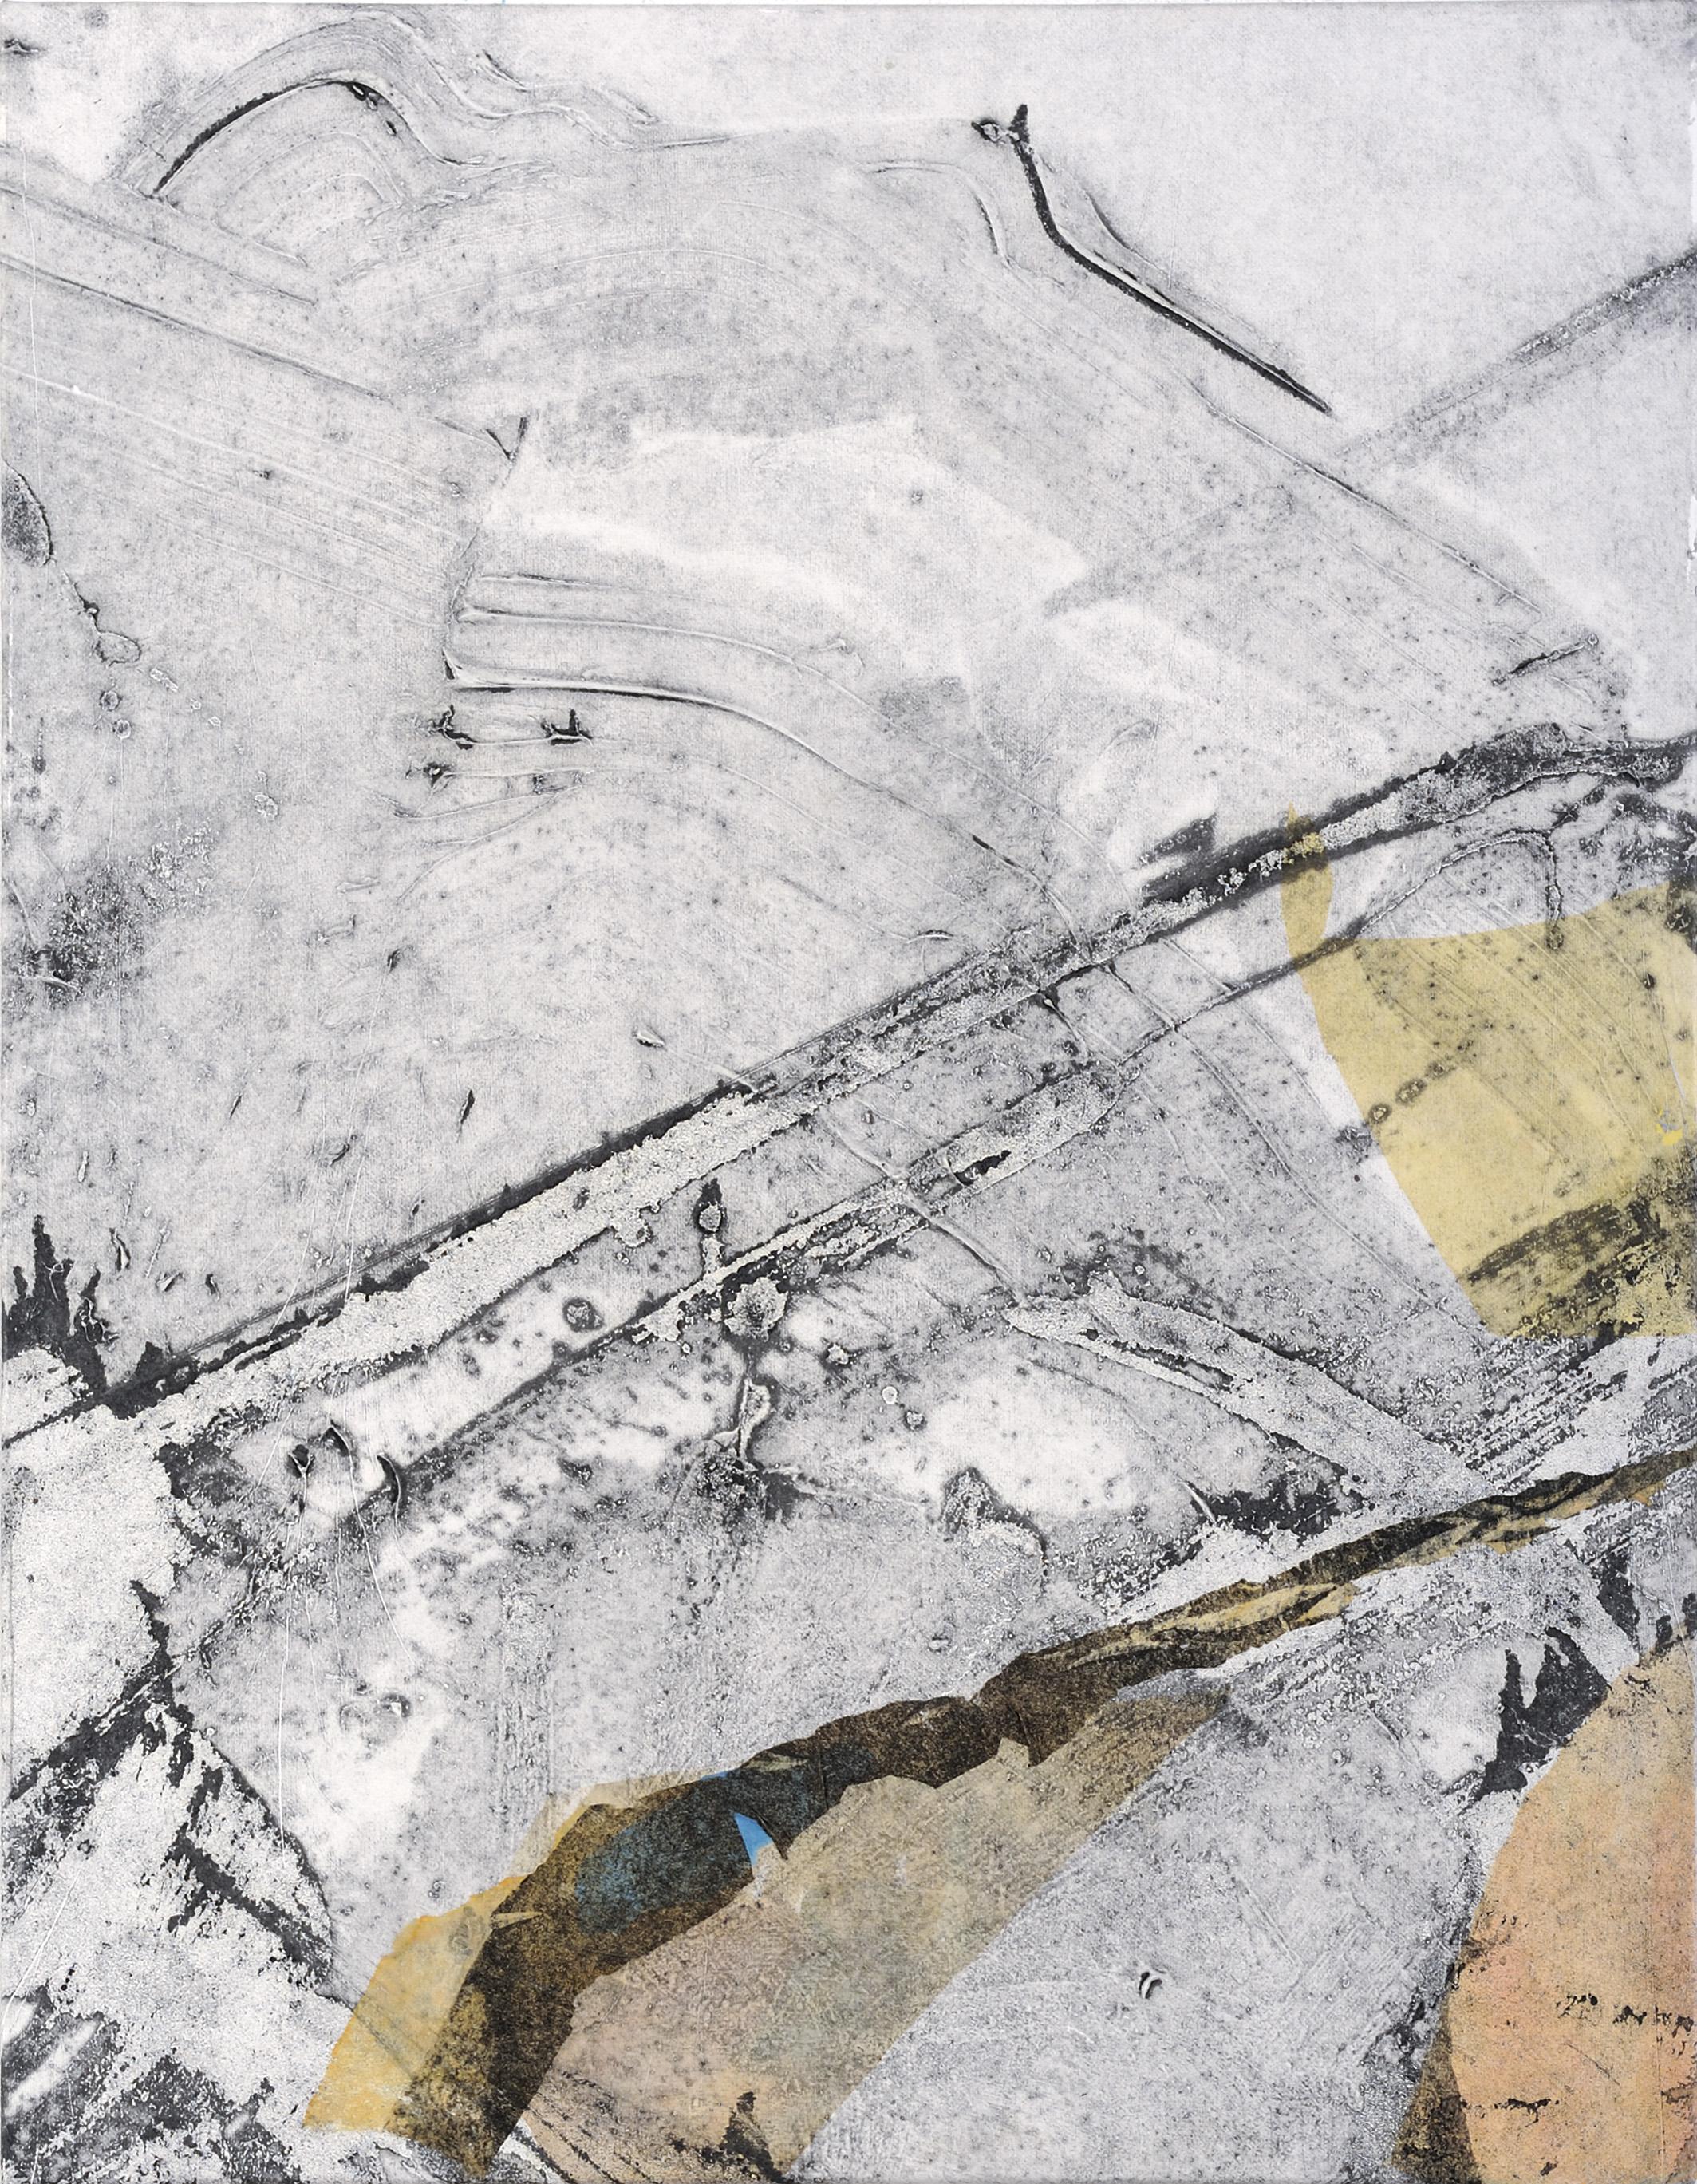 light collage 2 - mixed medium on canvas 90x70cm